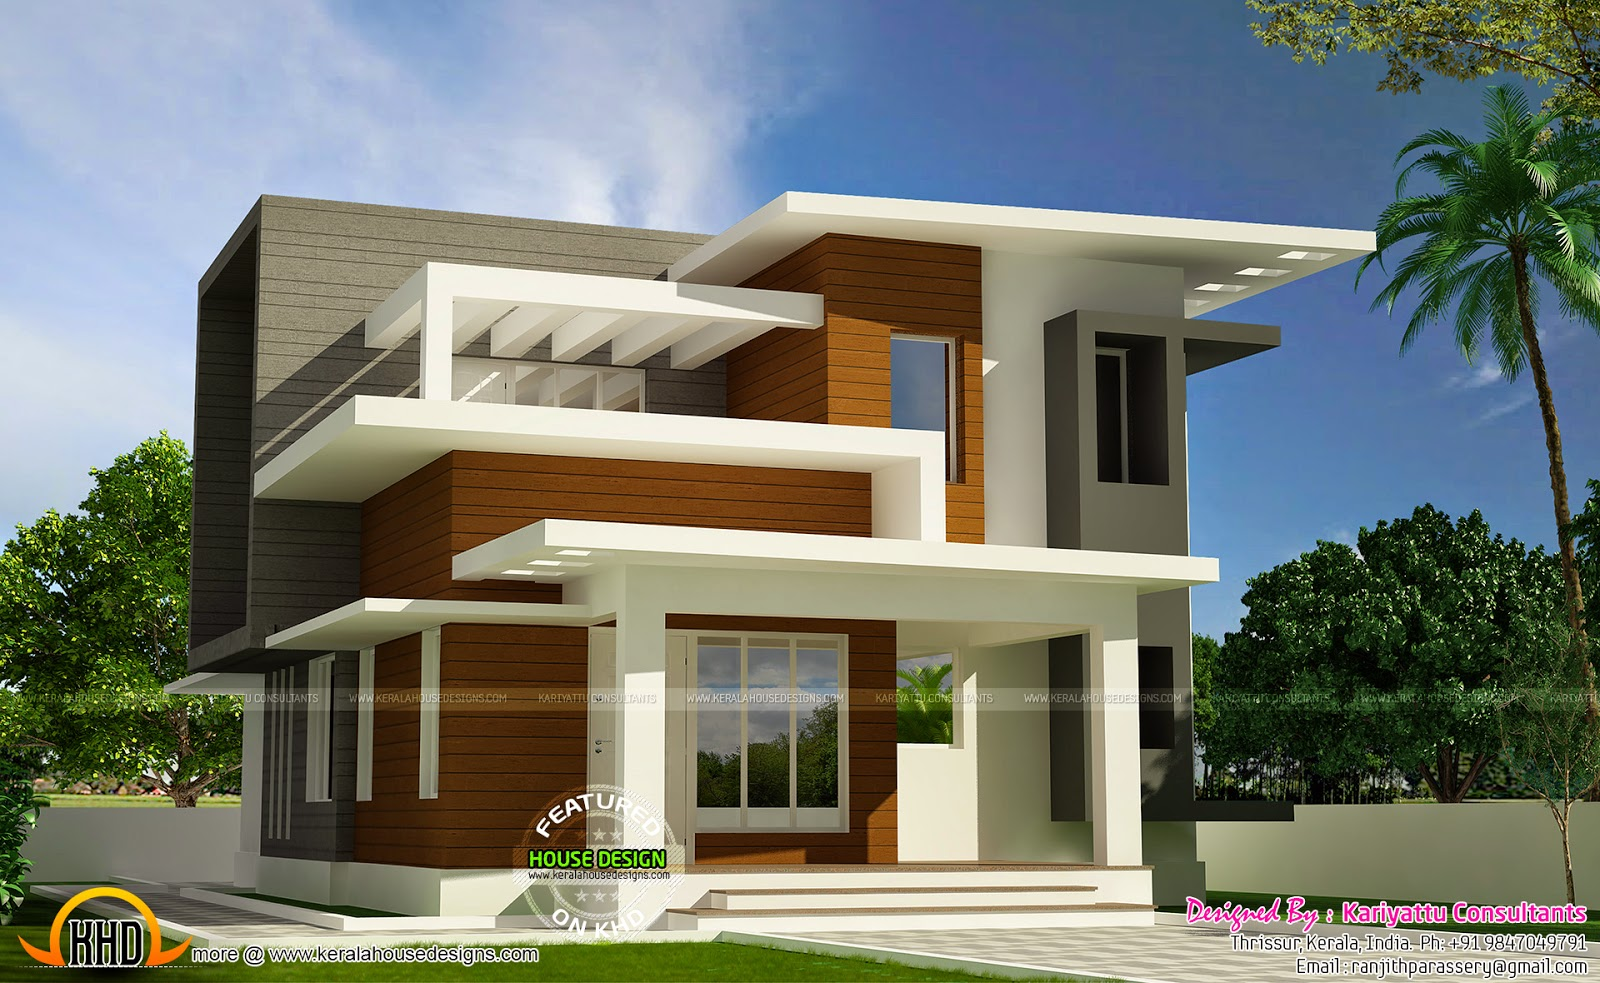 Bedroom House Plans Kerala Style Architect Pdf Kerala House - Simple village house design picture